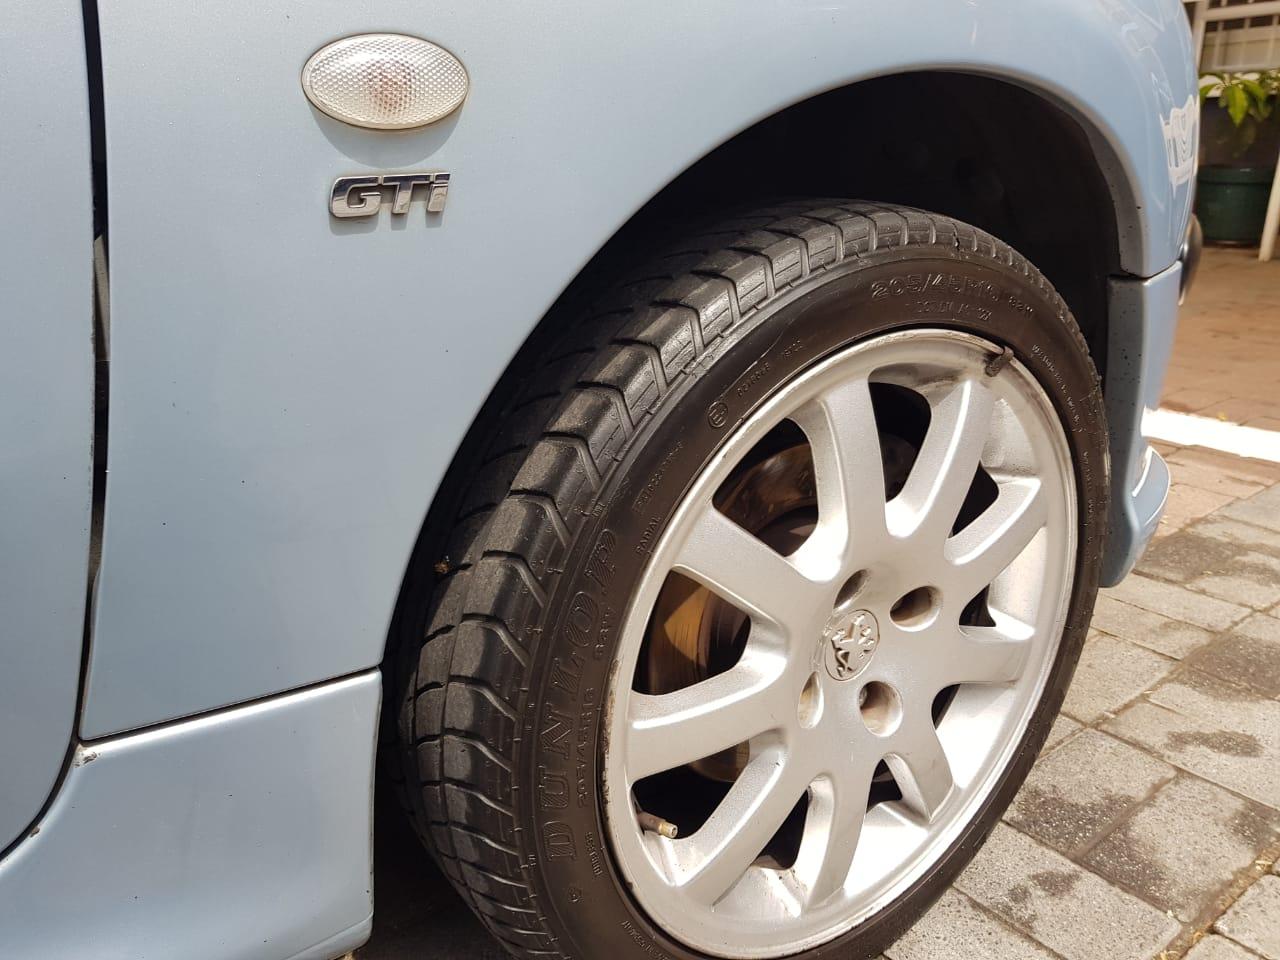 2004 Peugeot 206 GTi